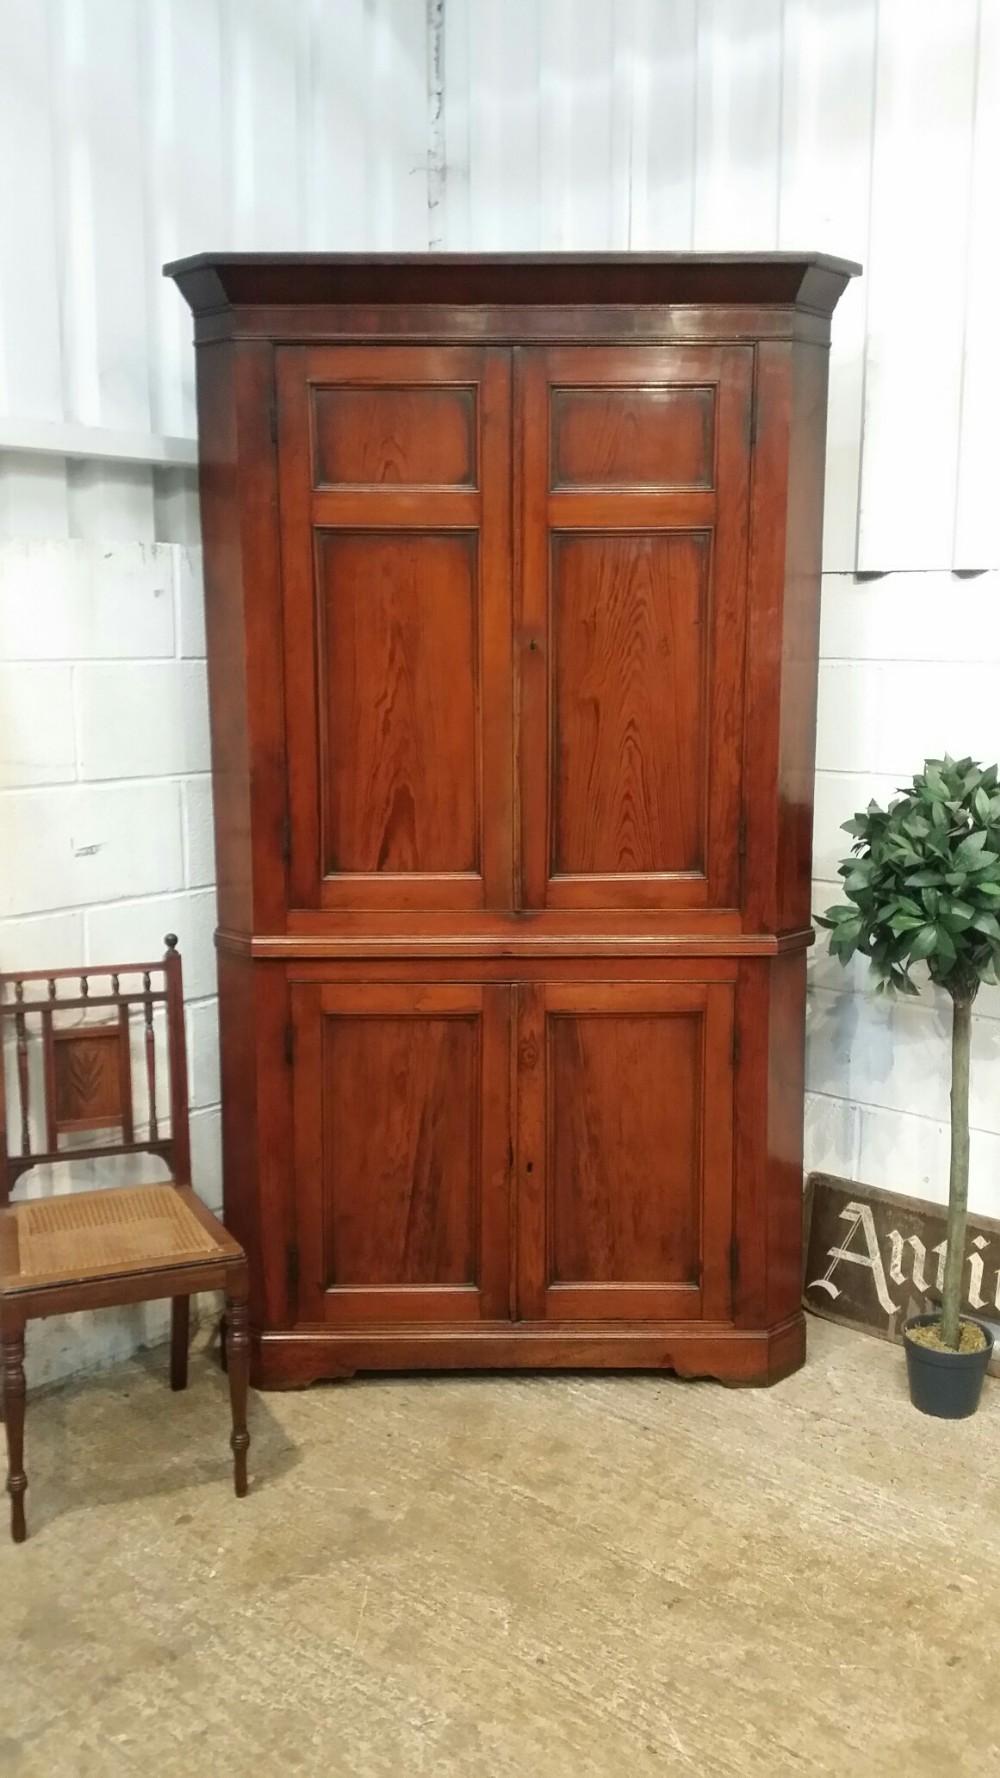 antique regency full height pitch pine corner cabinet c1820 - Antique Regency Full Height Pitch Pine Corner Cabinet C1820 519008